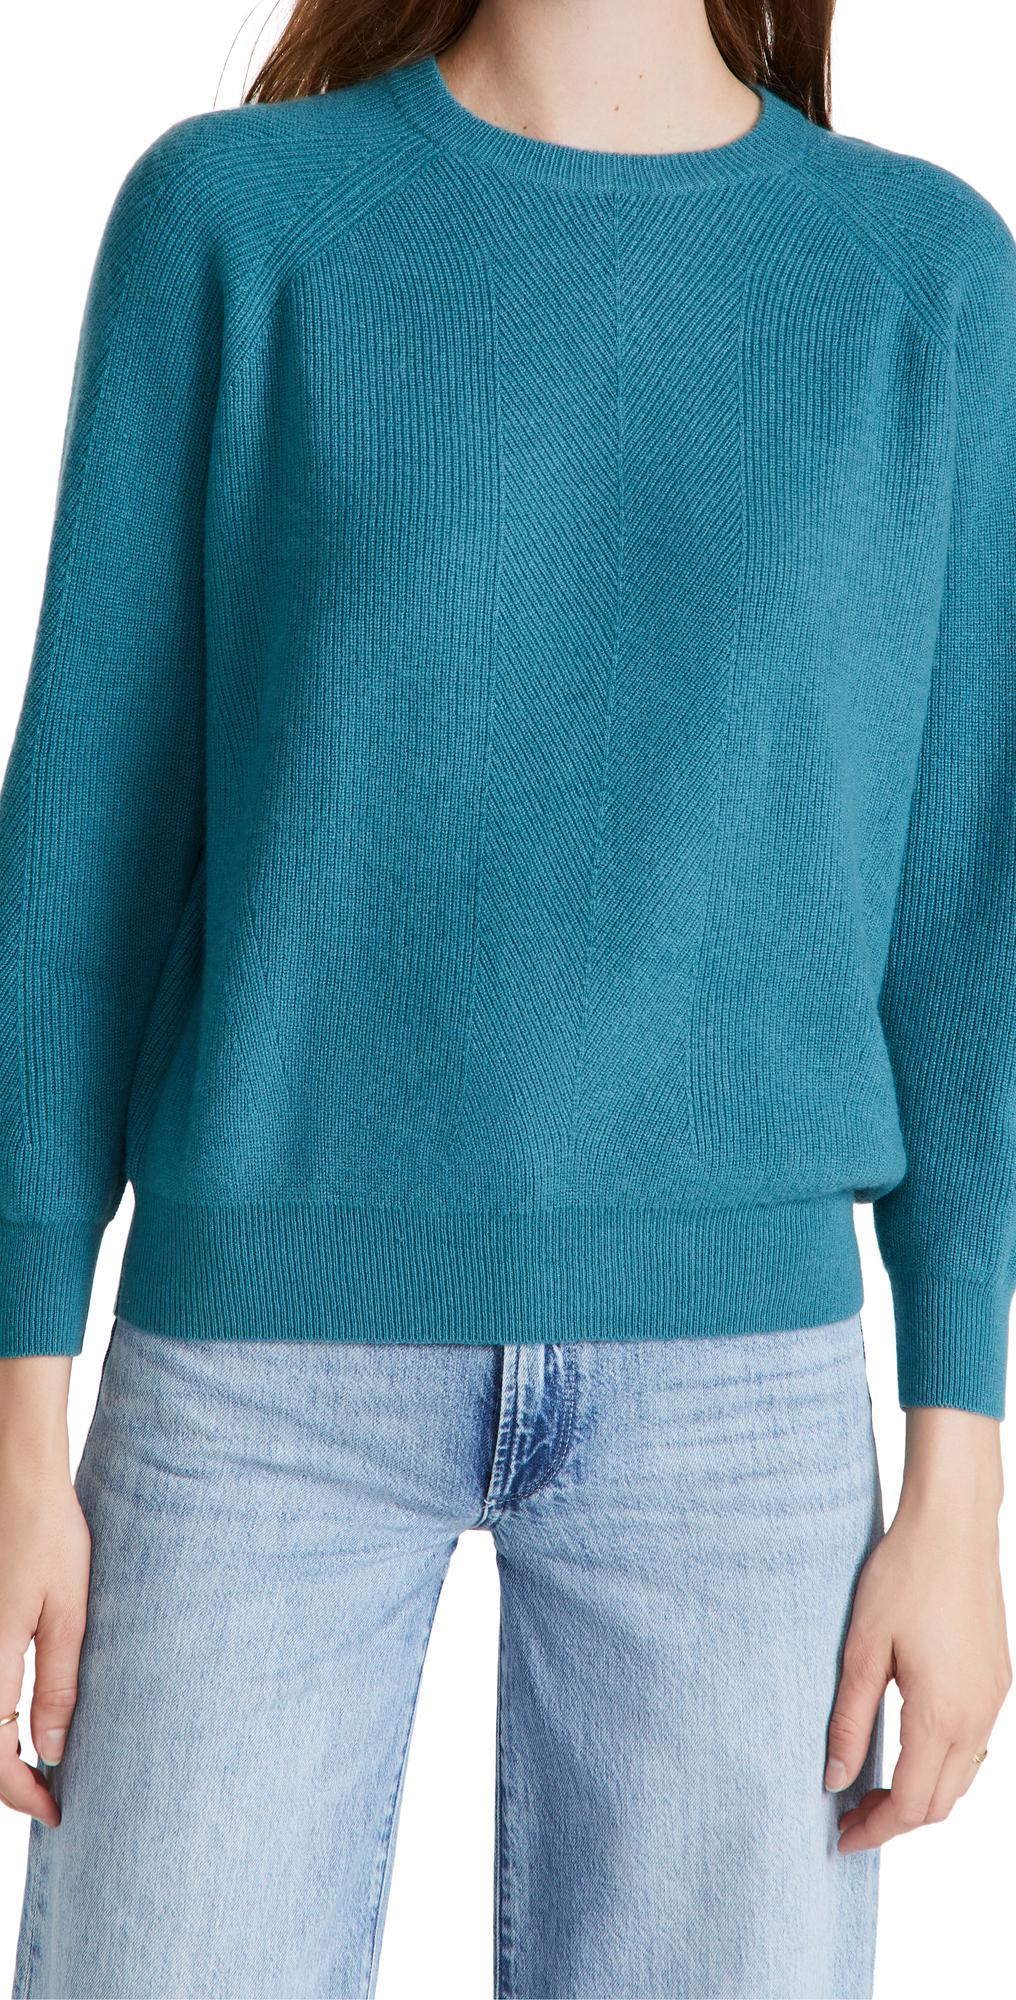 Keaton Cashmere Sweater